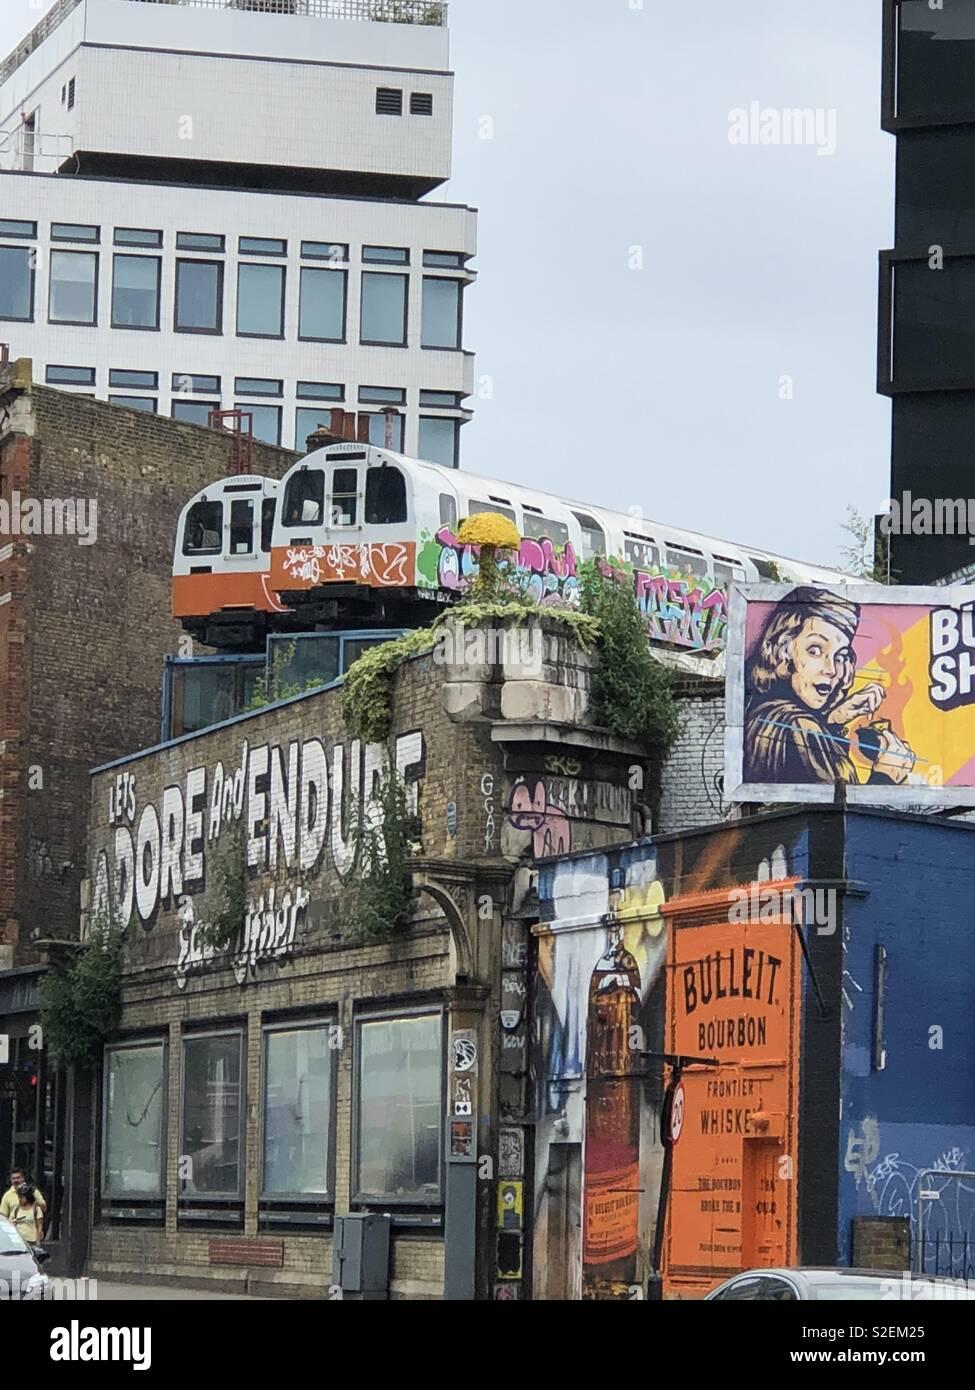 East London Graffiti - Stock Image